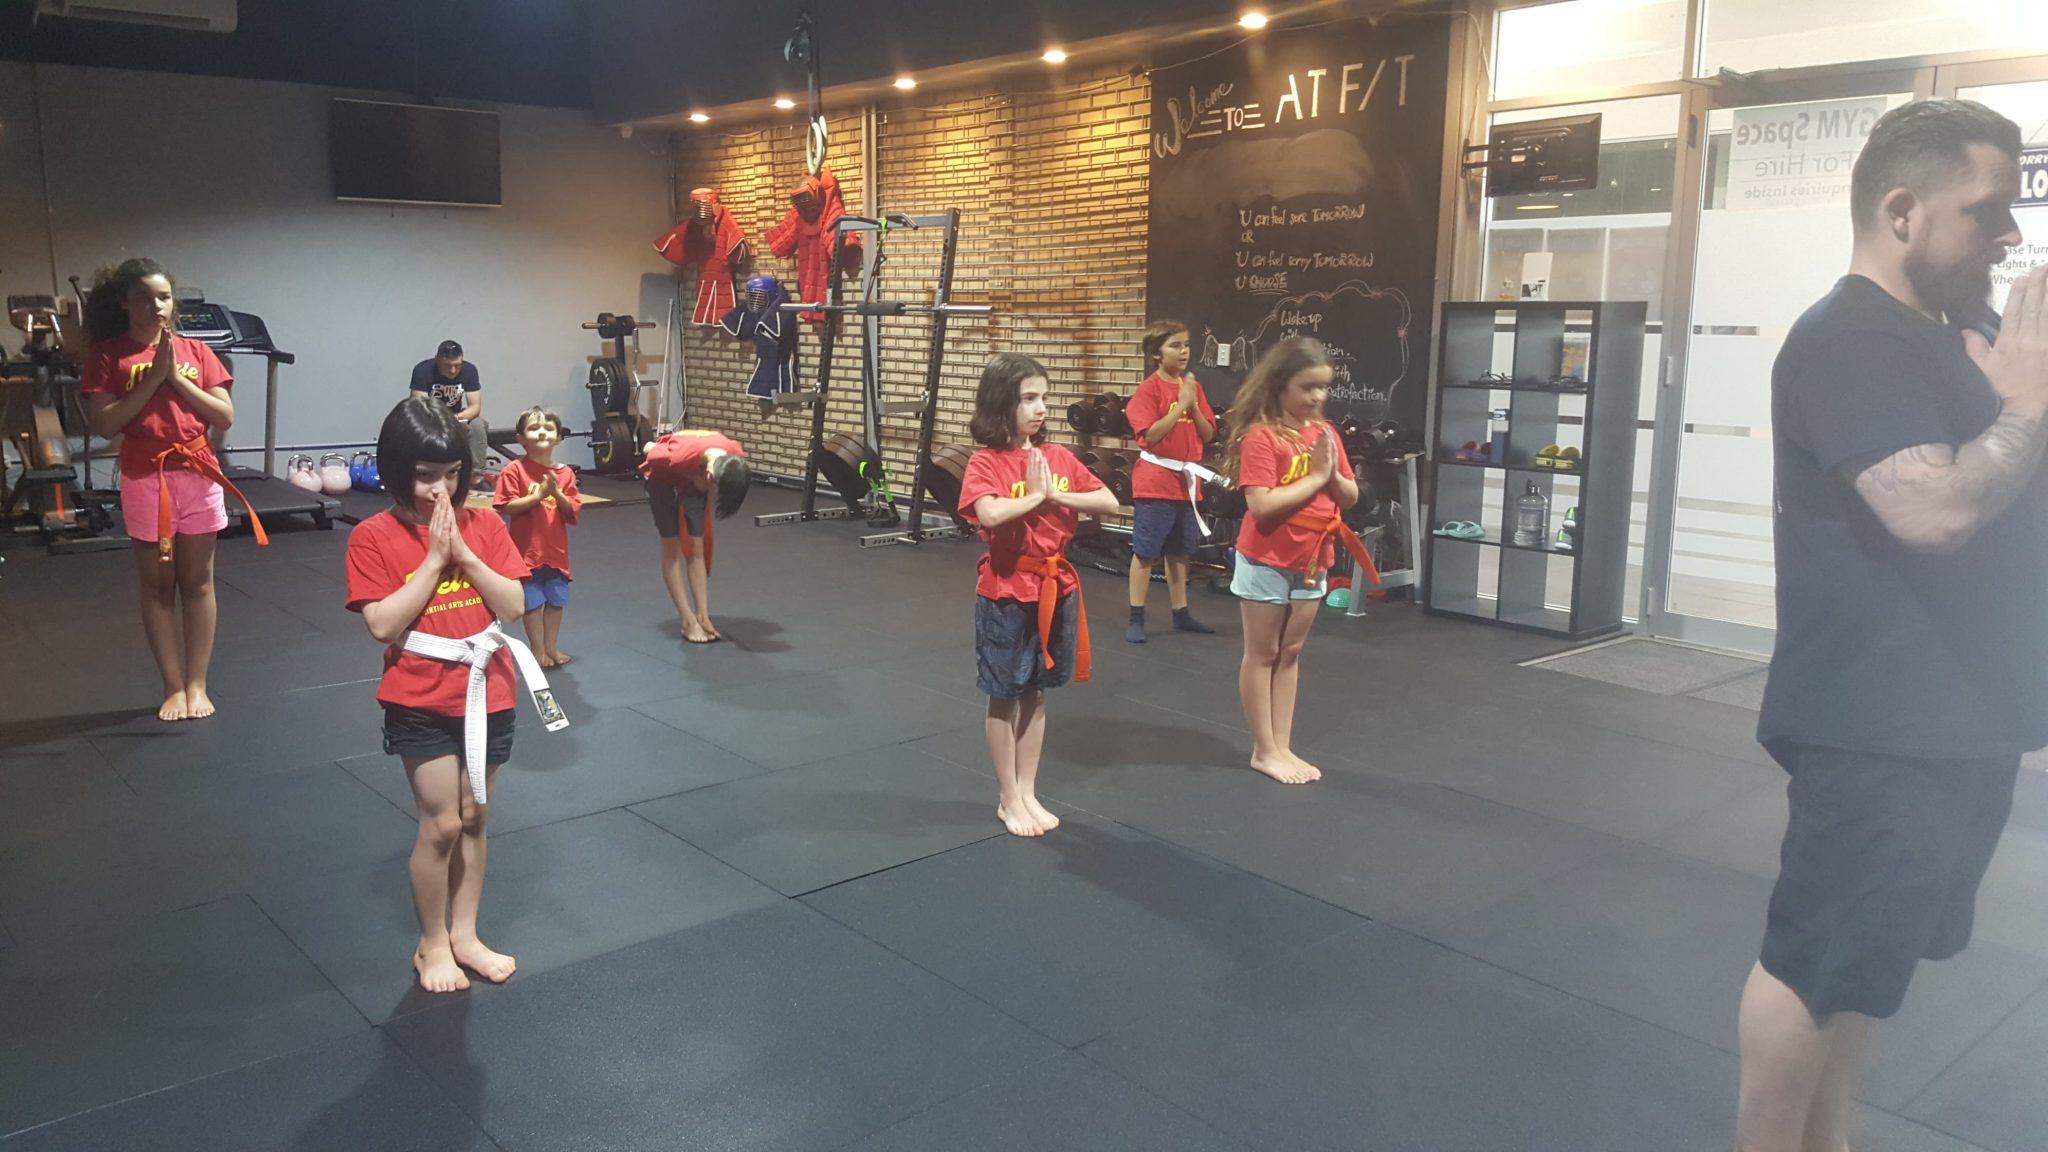 Kids, Children, martial arts, karate, tae kwon do, kali, jkd, fma